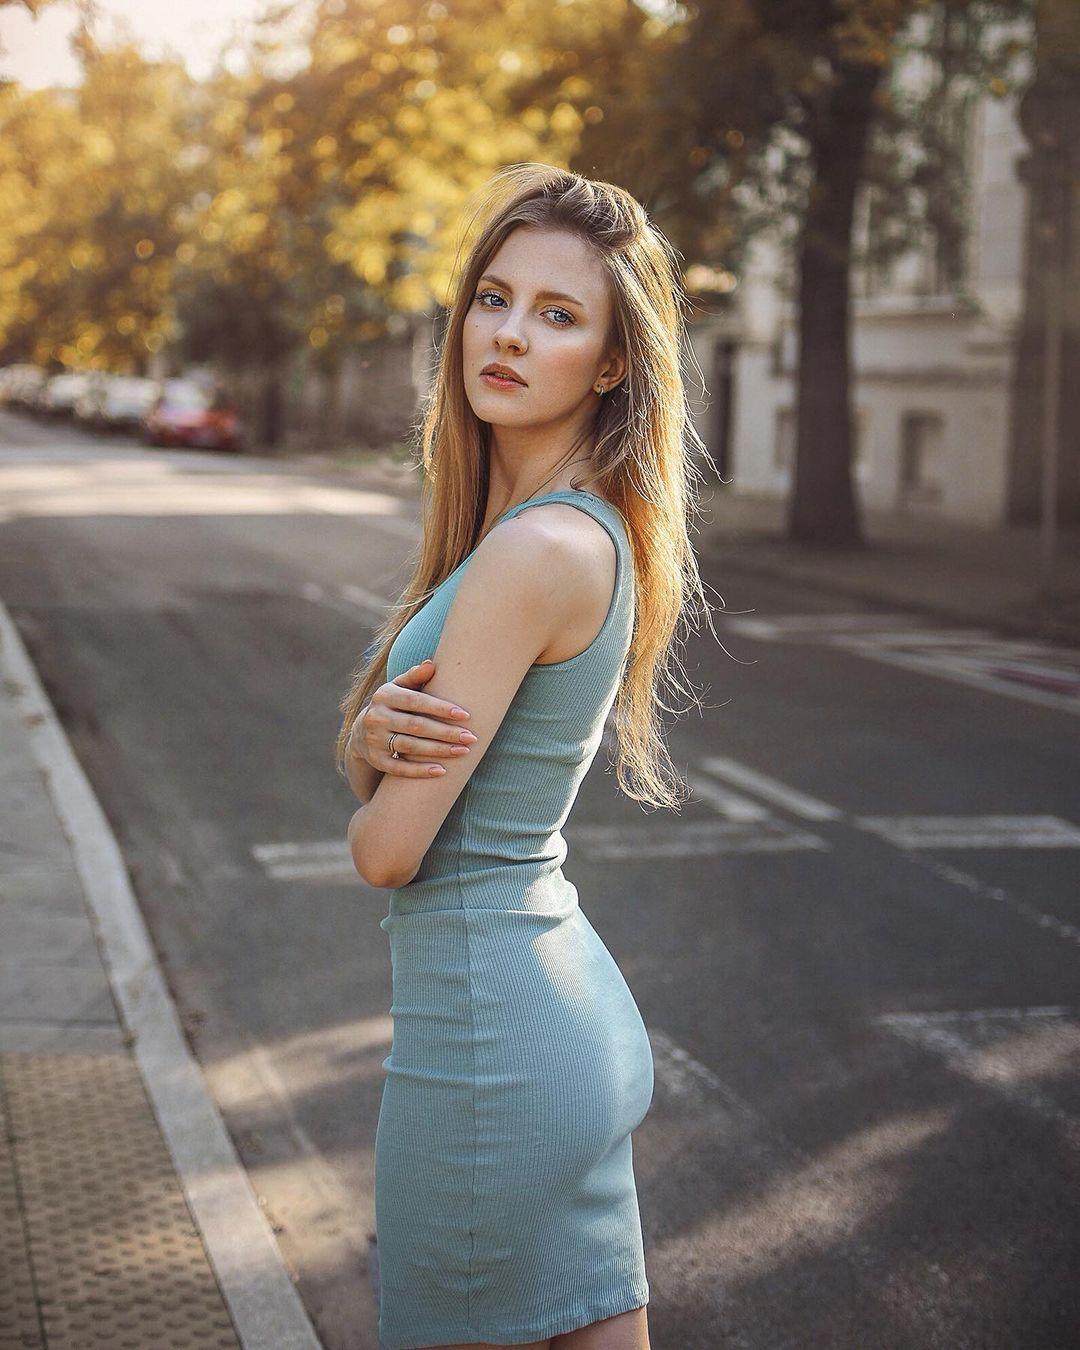 Nicole-marie-j-Wallpapers-Insta-Fit-Bio-1